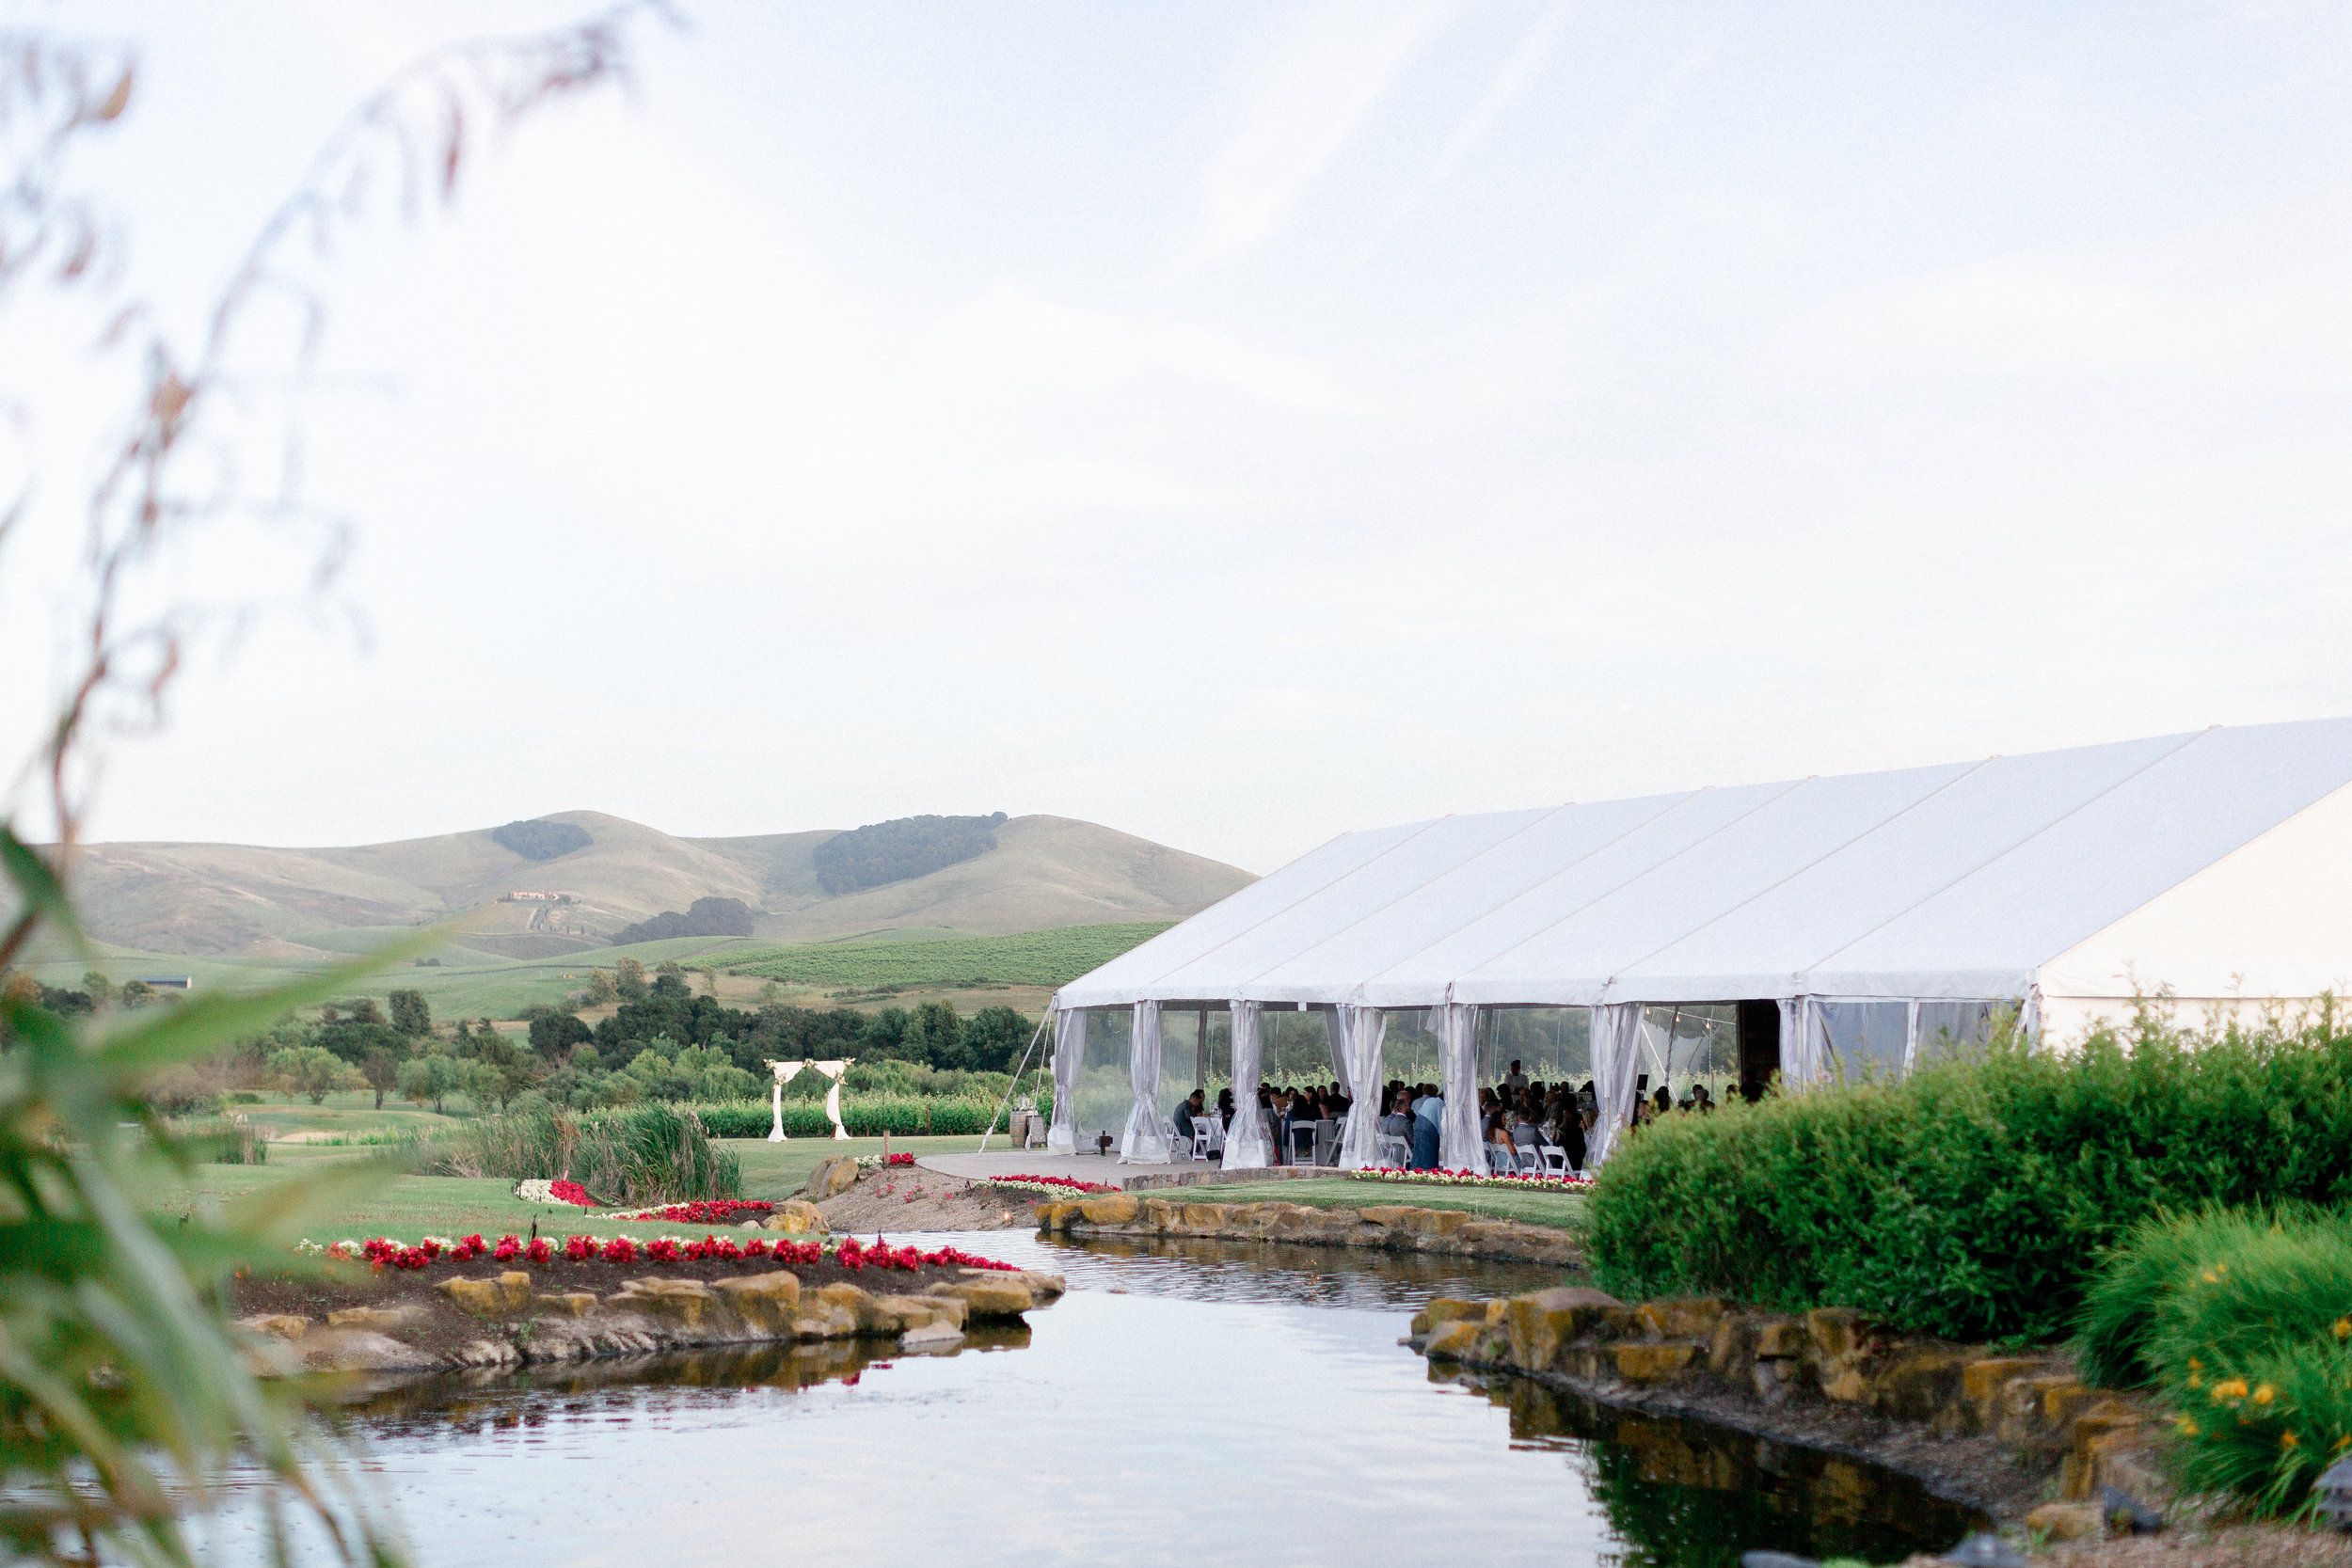 Eagle-Vines-Golf-Course-wedding-photographer (173 of 206).jpg